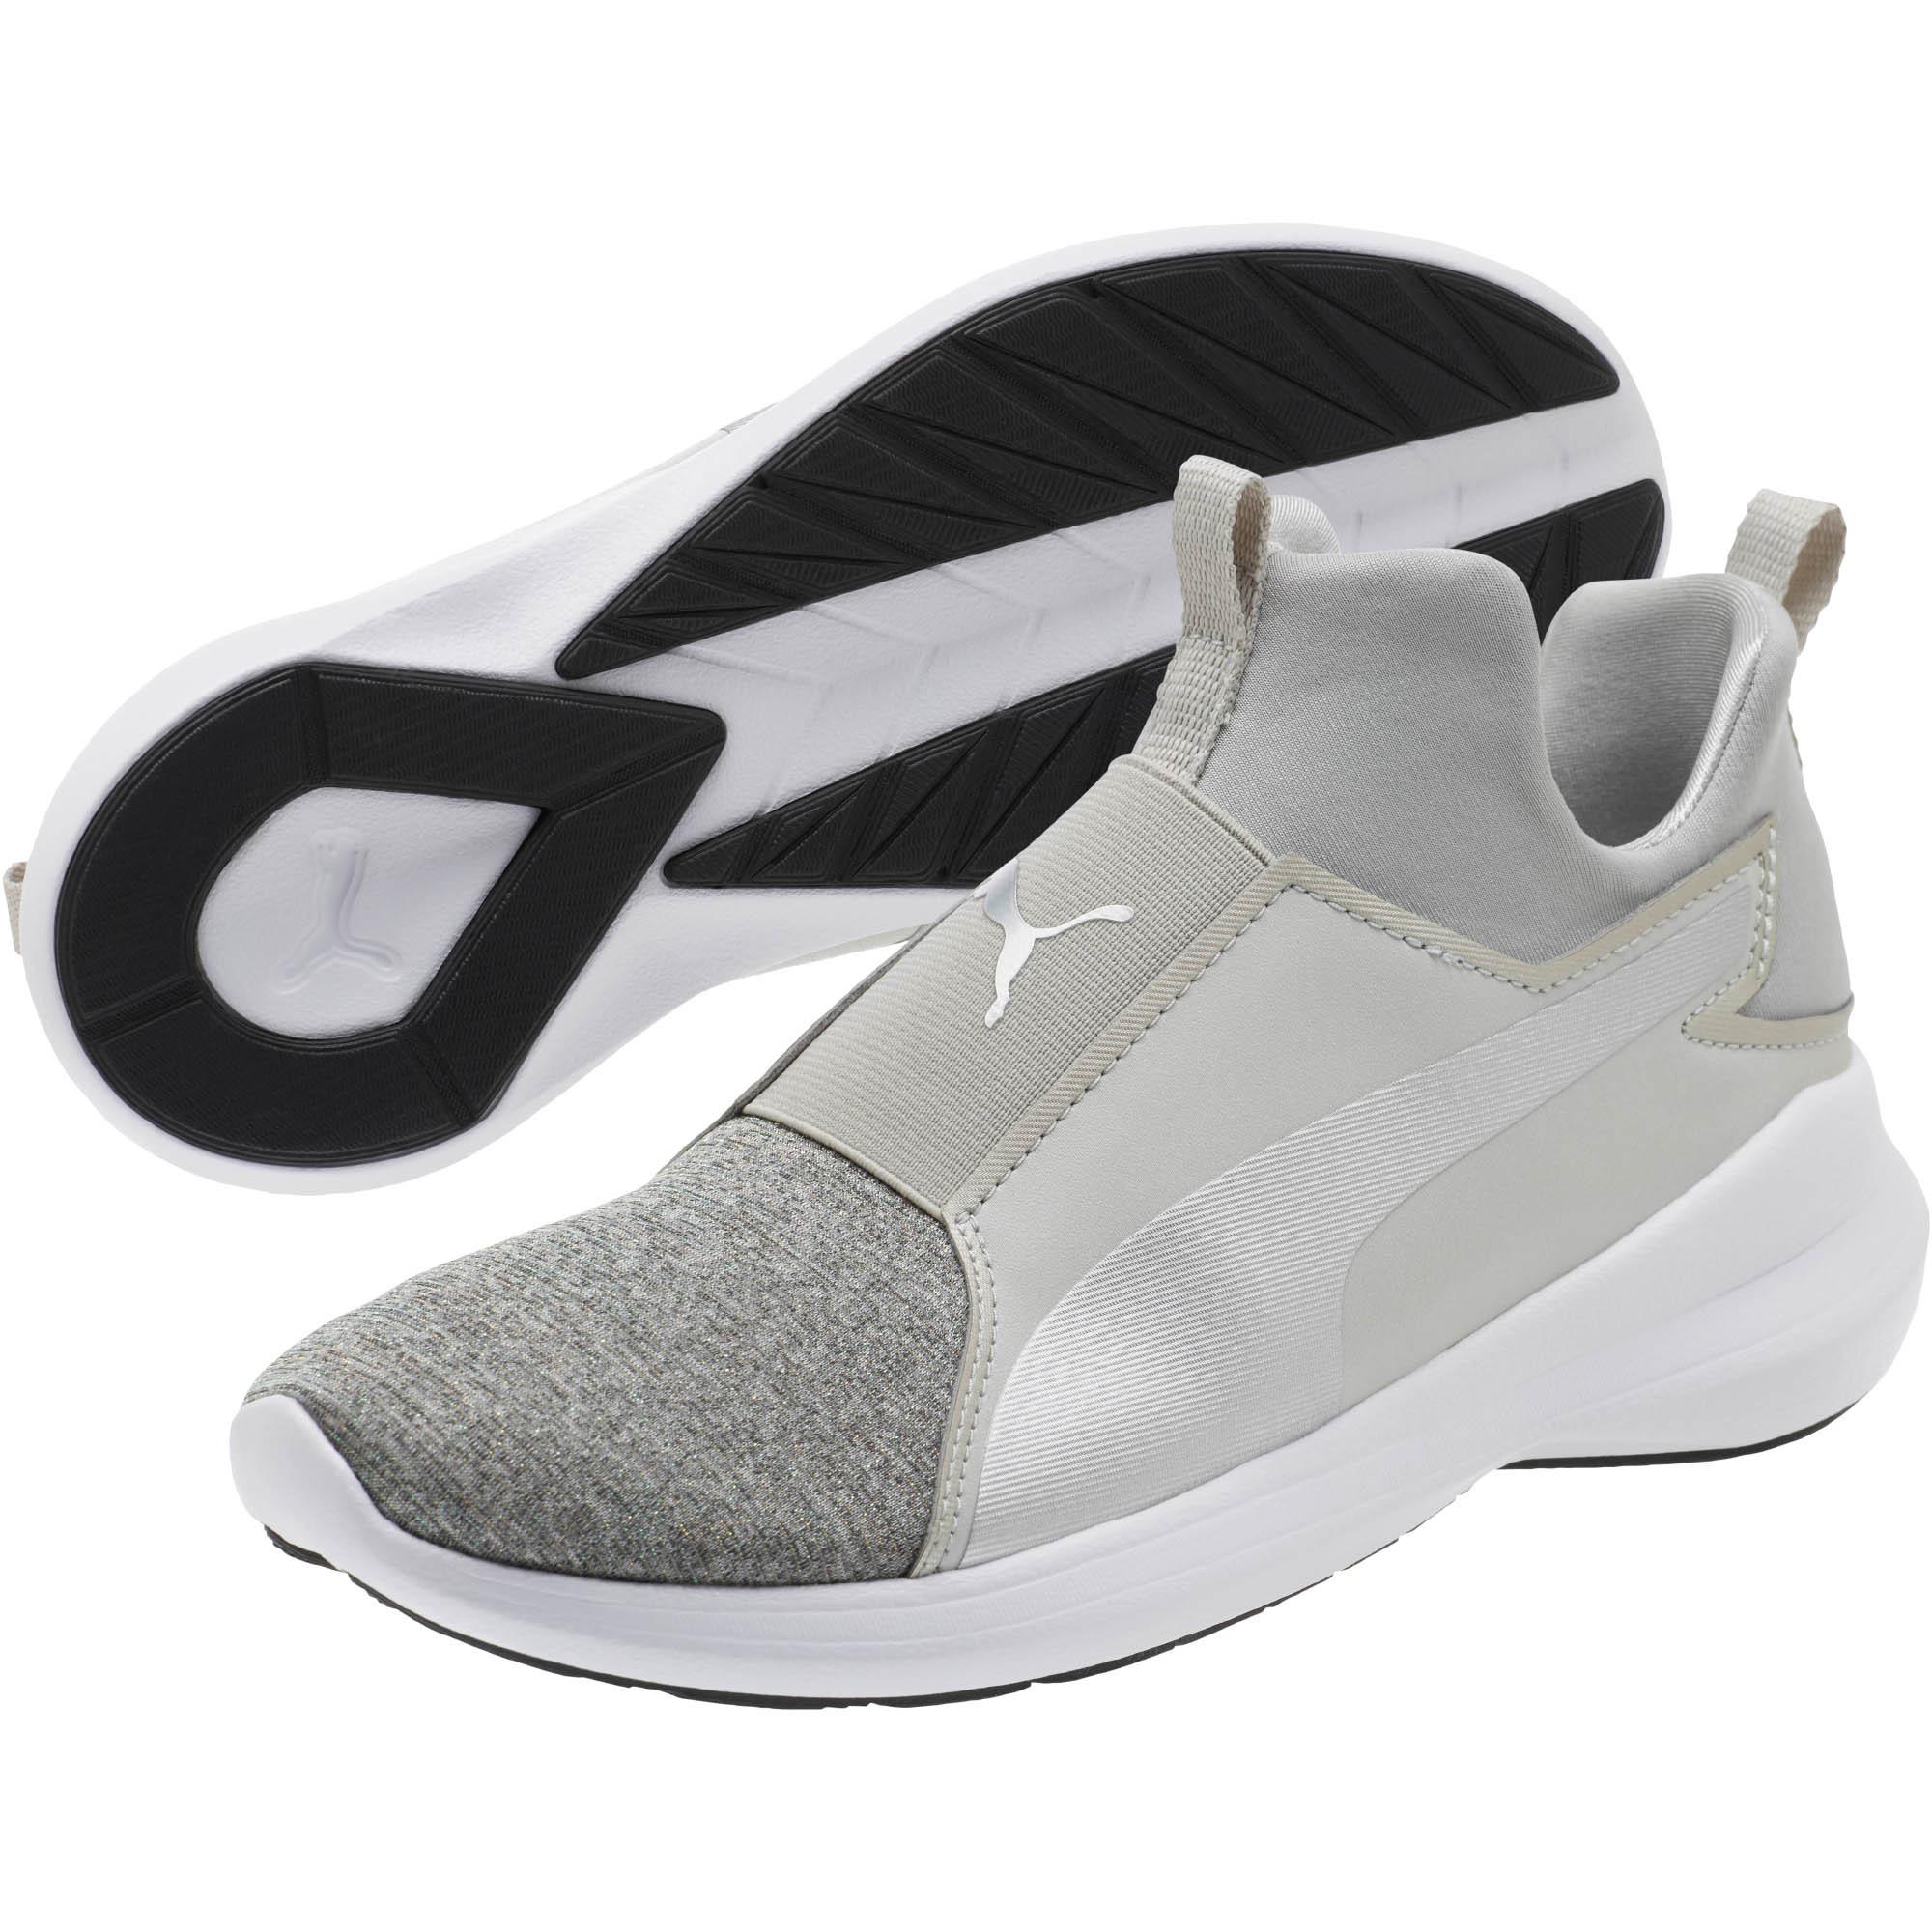 7b363fd20815 Official Puma Store  Puma Rebel Mid Glow JR Sneakers